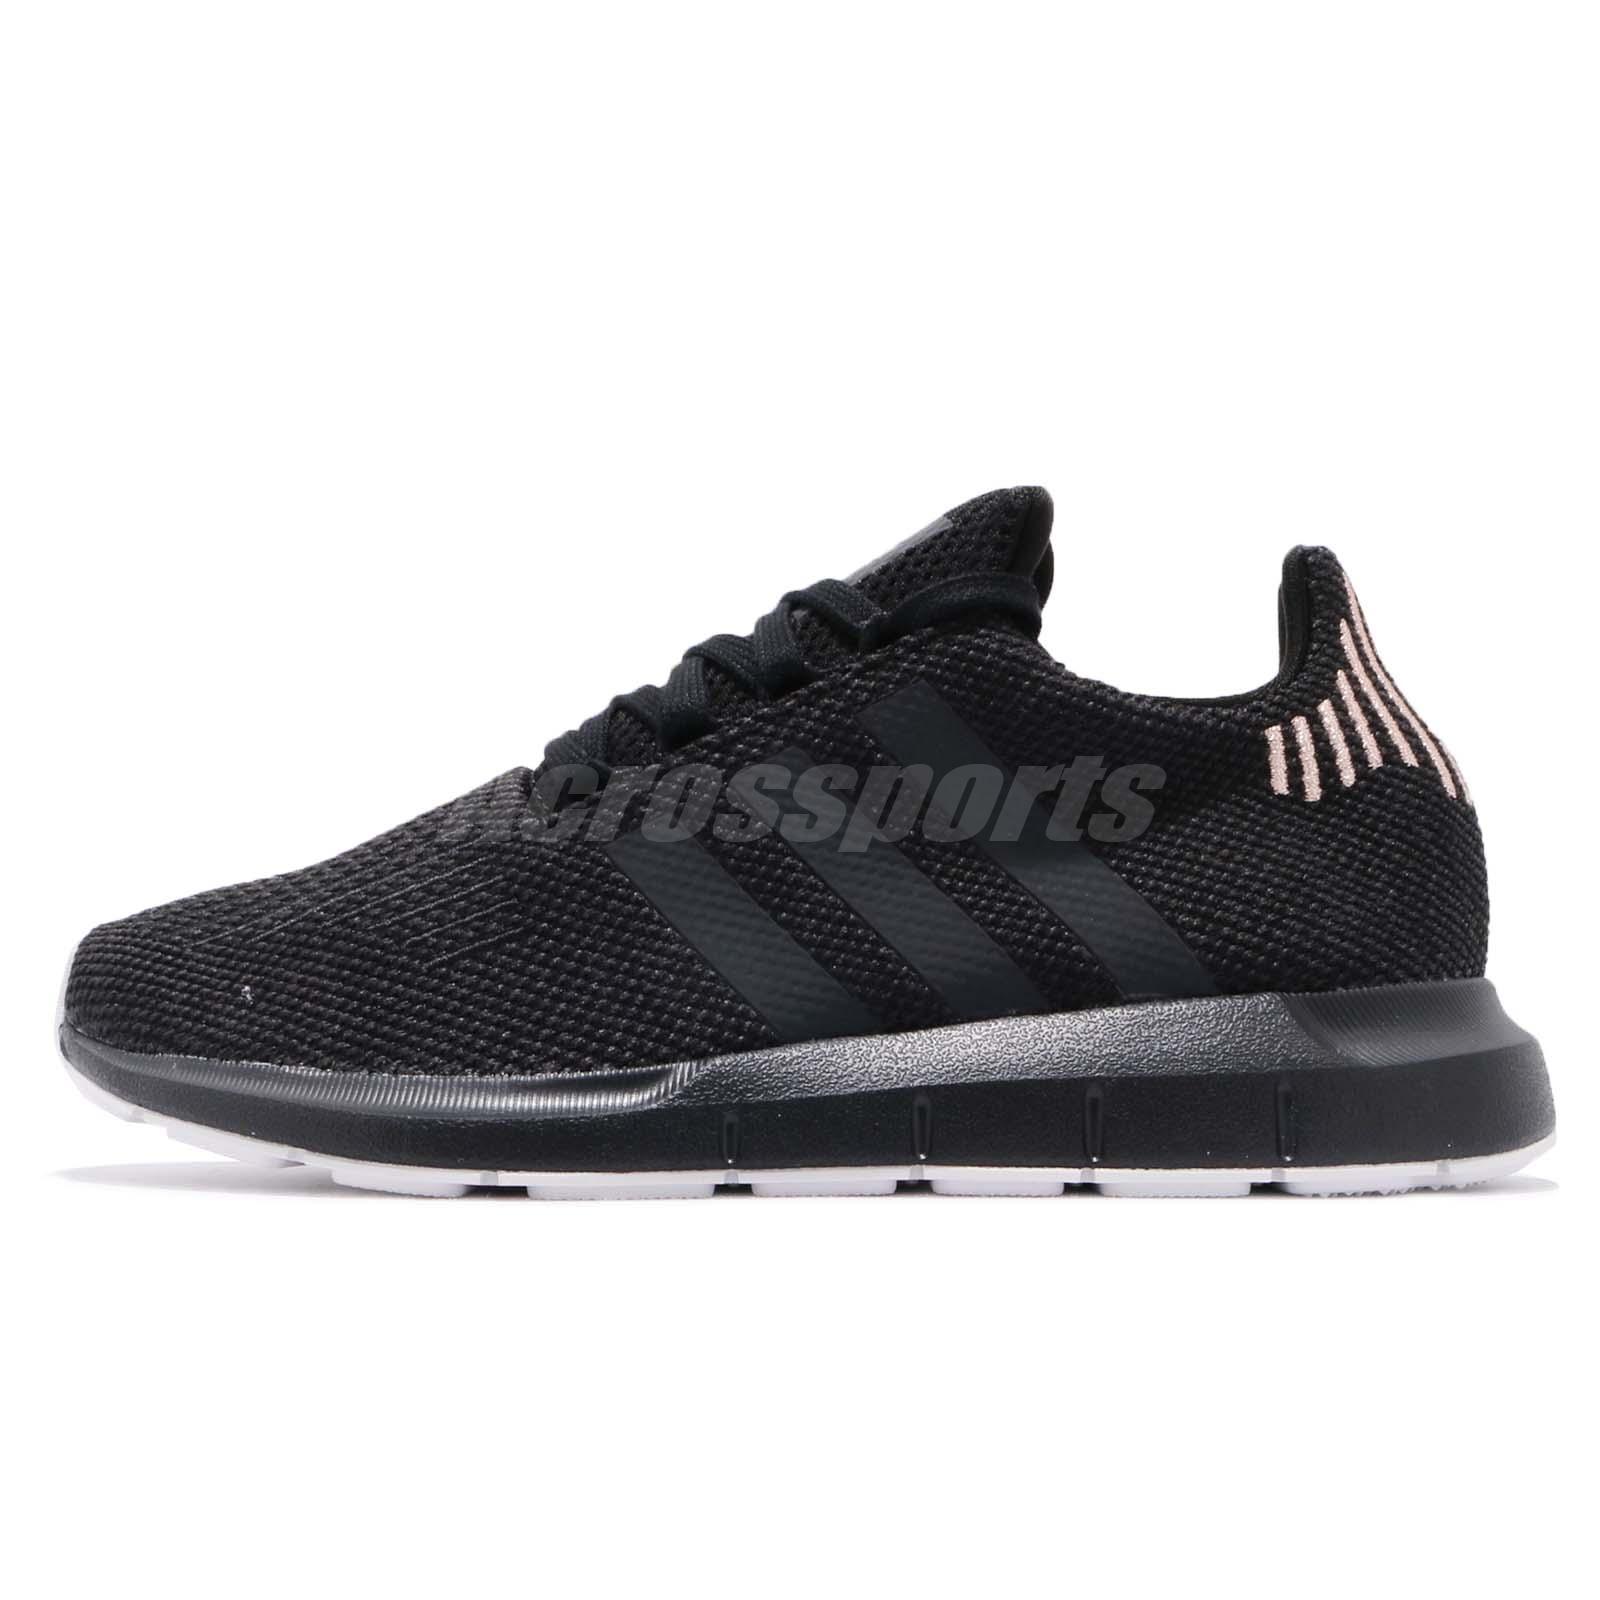 a22ea608480a07 adidas Originals Swift Run W Black Carbon Women Running Shoes Sneakers  B37723